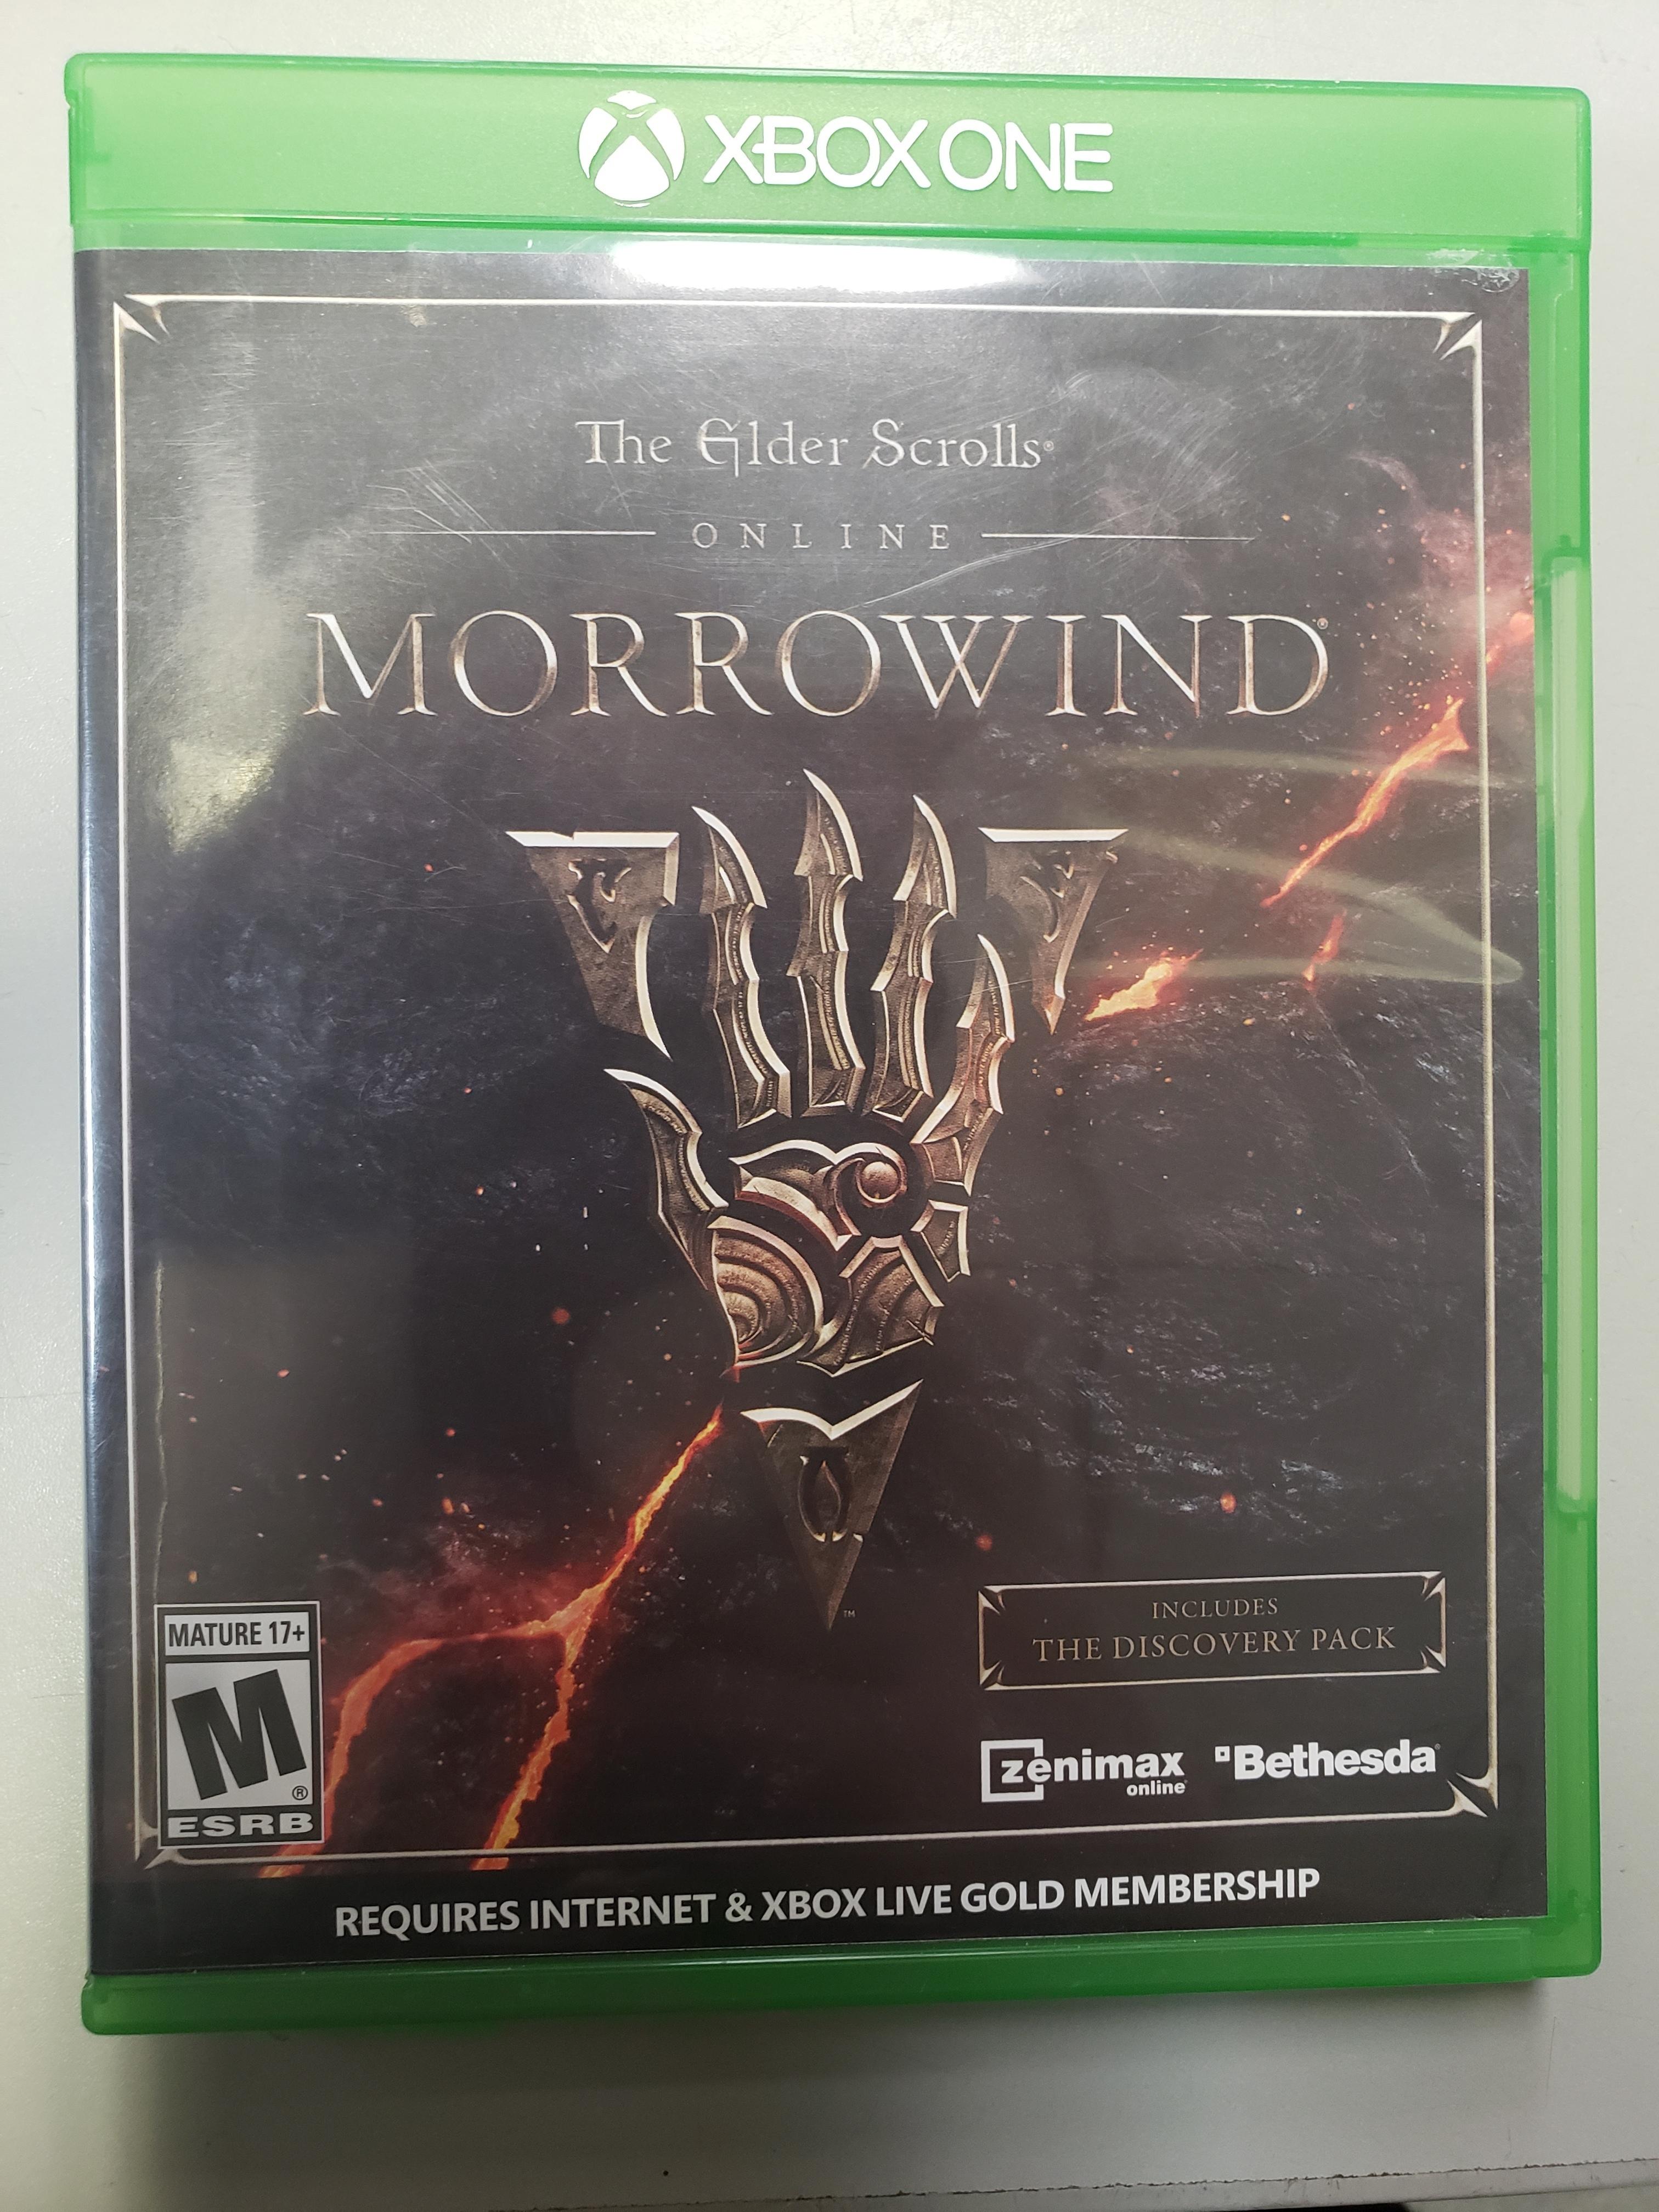 THE ELDER SCROLLS ONLINE: MORROWIND - XBOX ONE GAME